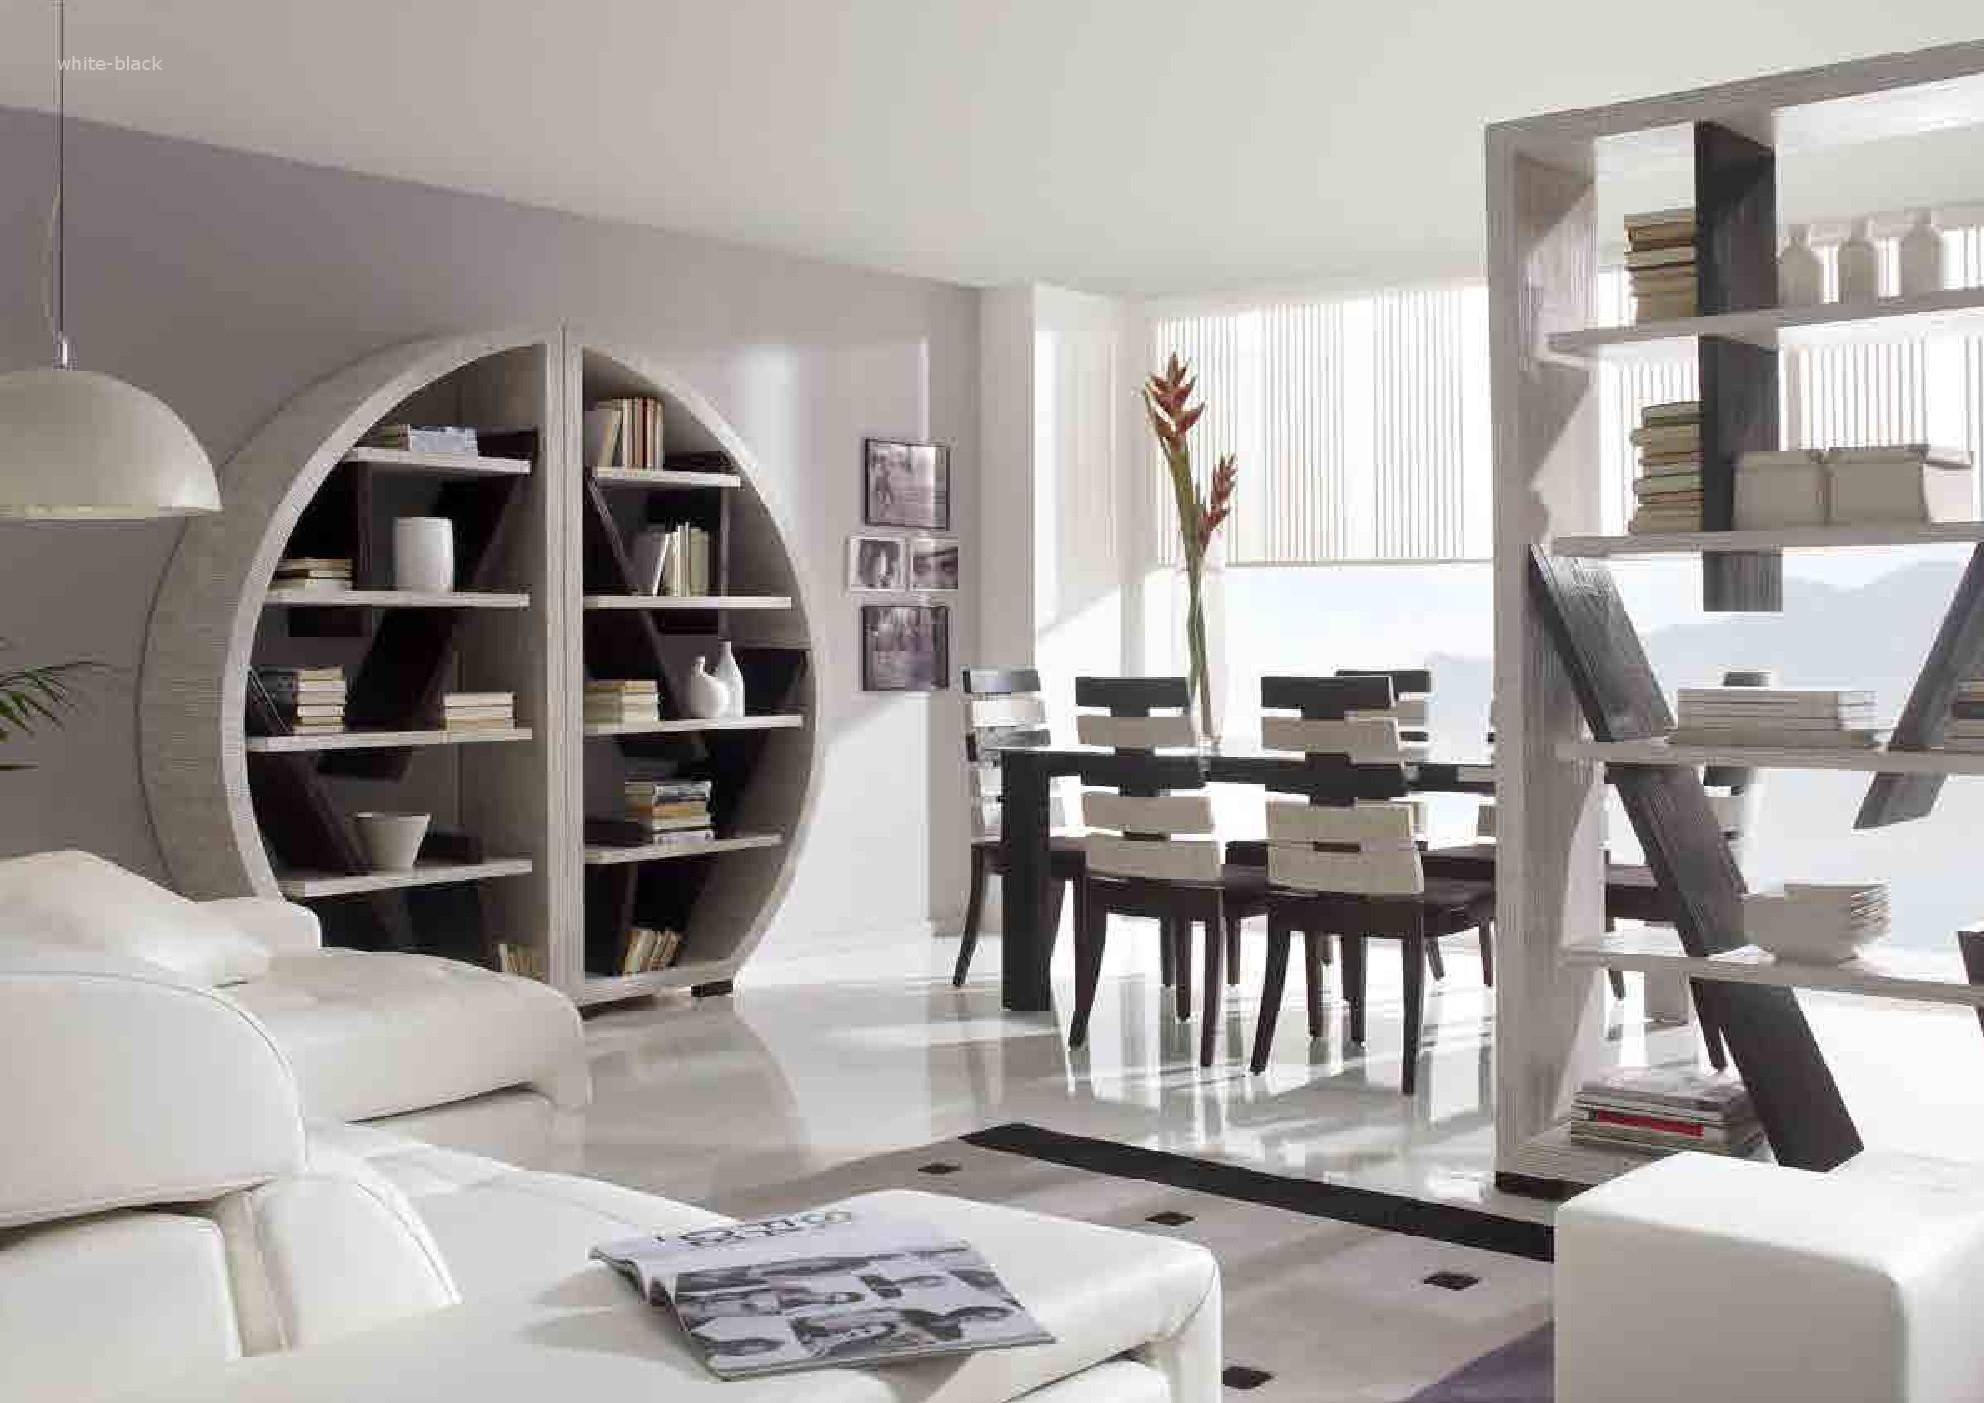 Awesome Soggiorno Completo Gallery - Design Trends 2017 - shopmakers.us